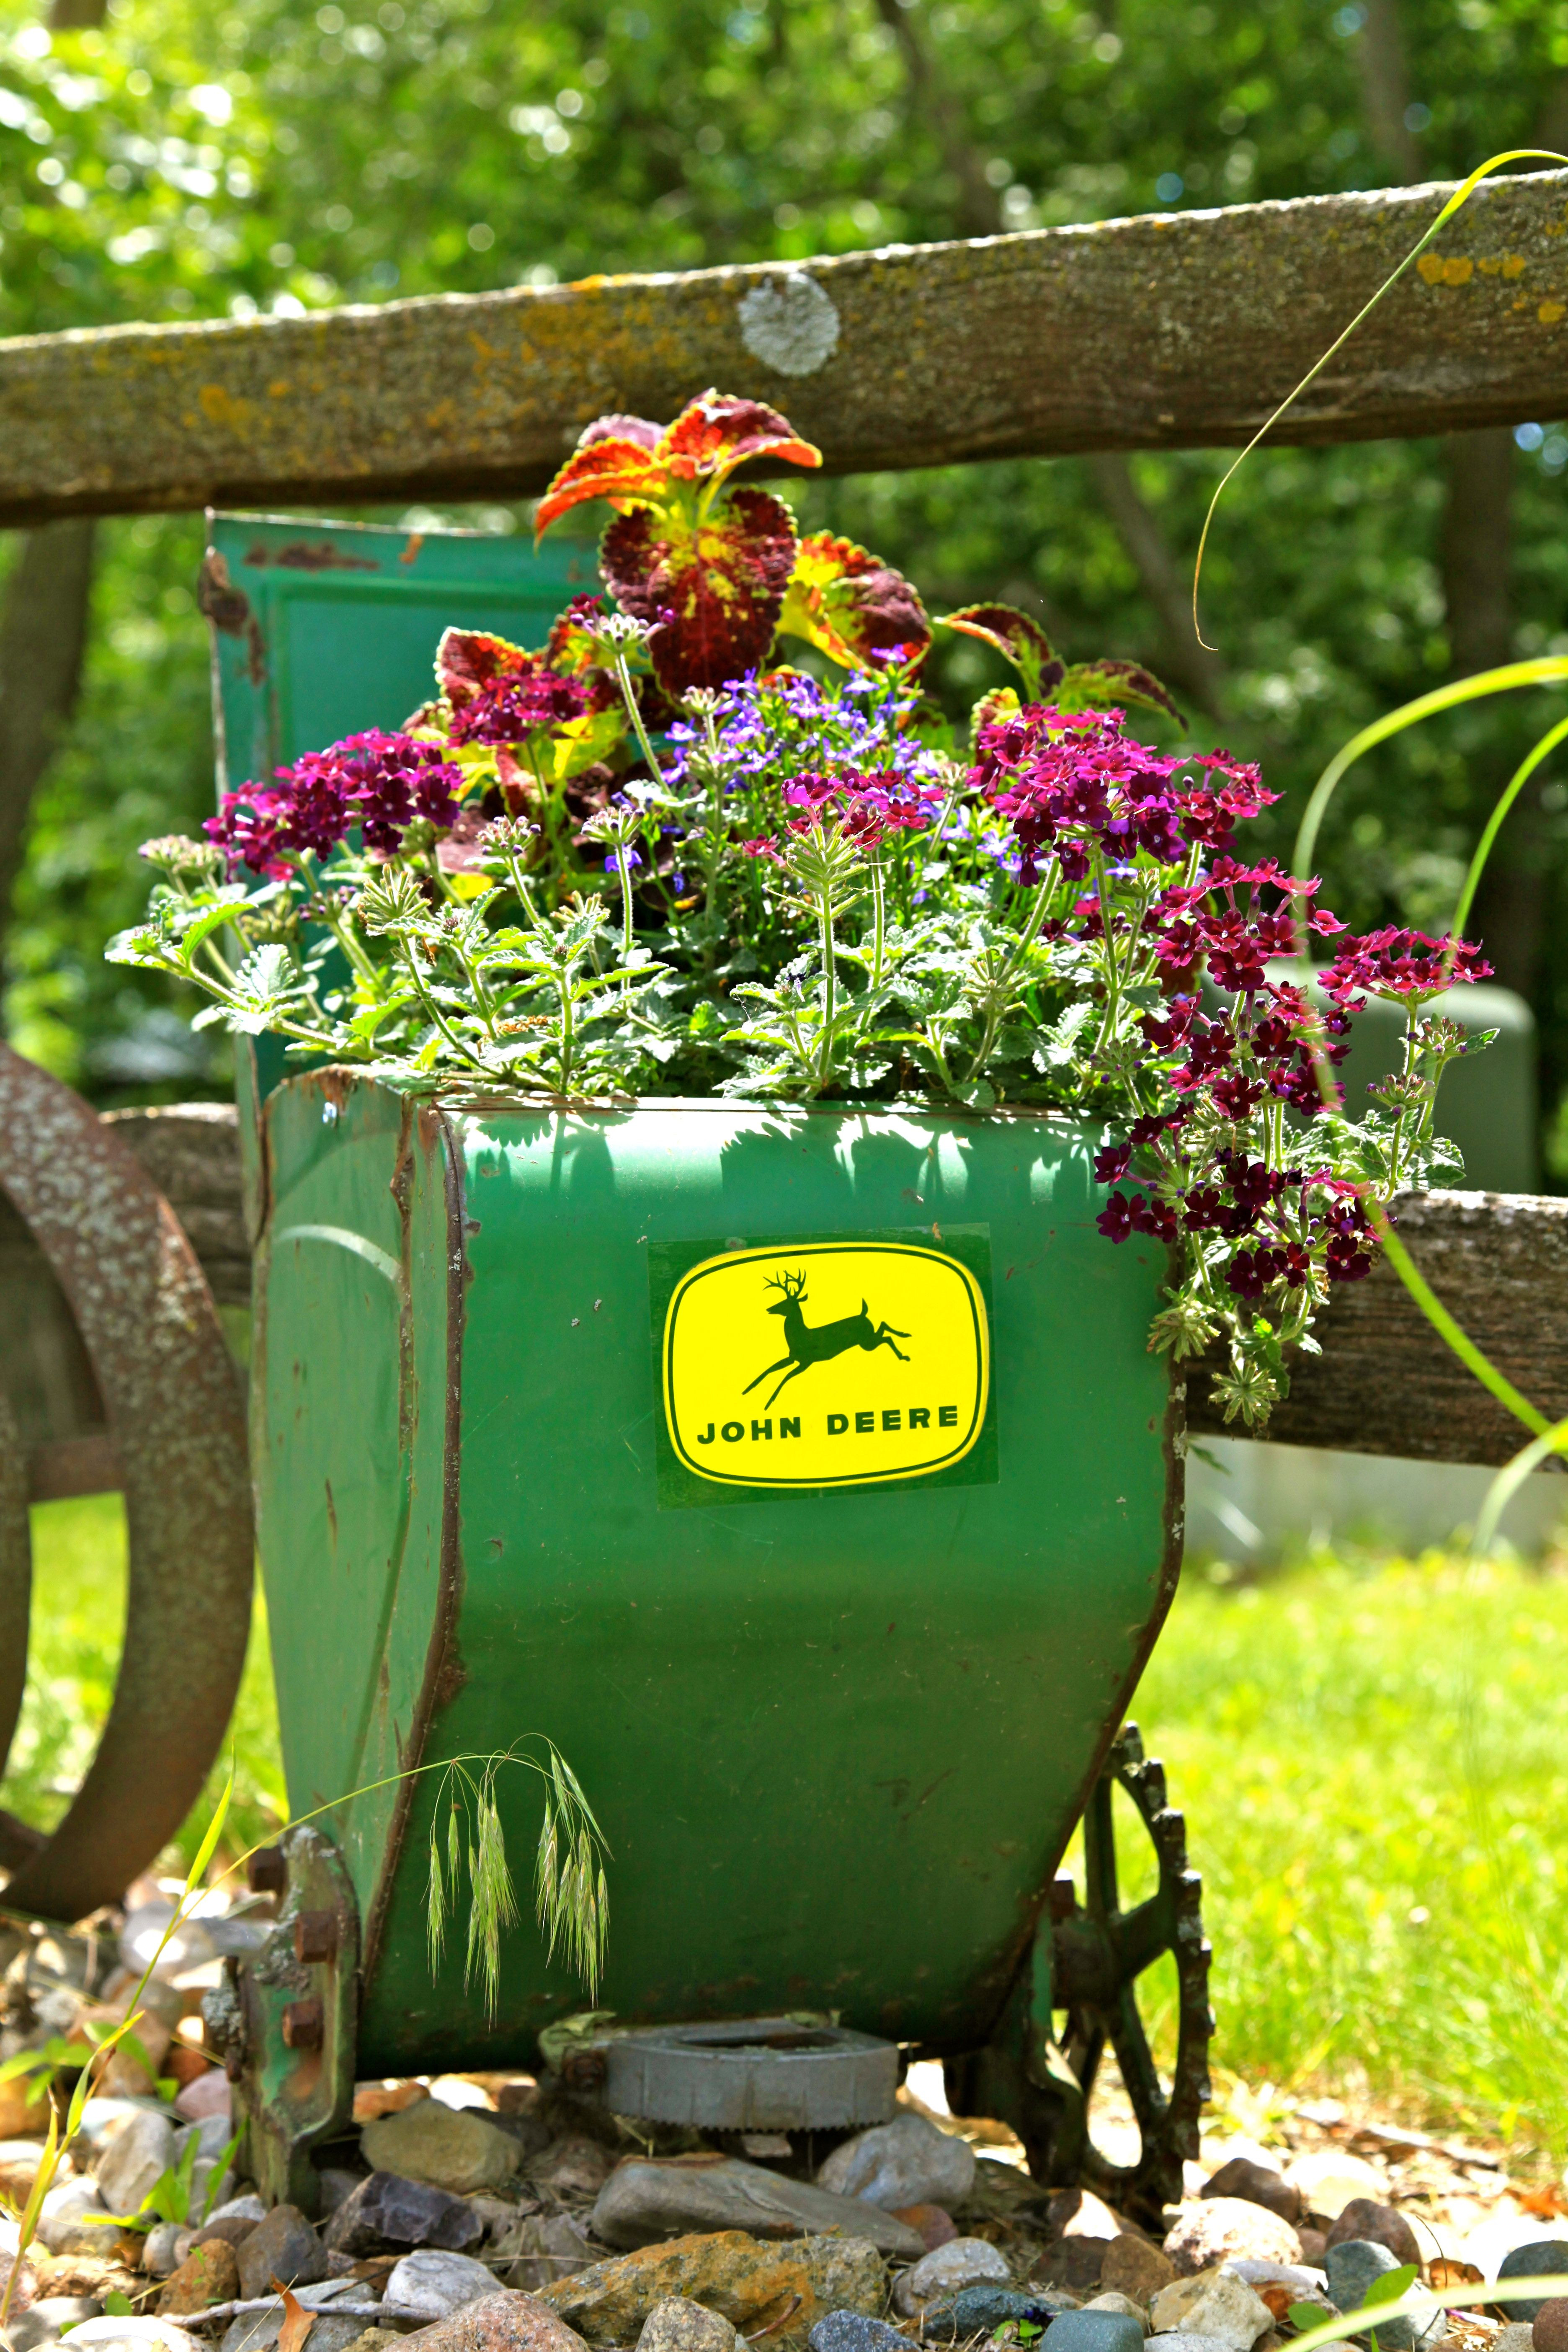 The best use of a John Deere planter Flower pots